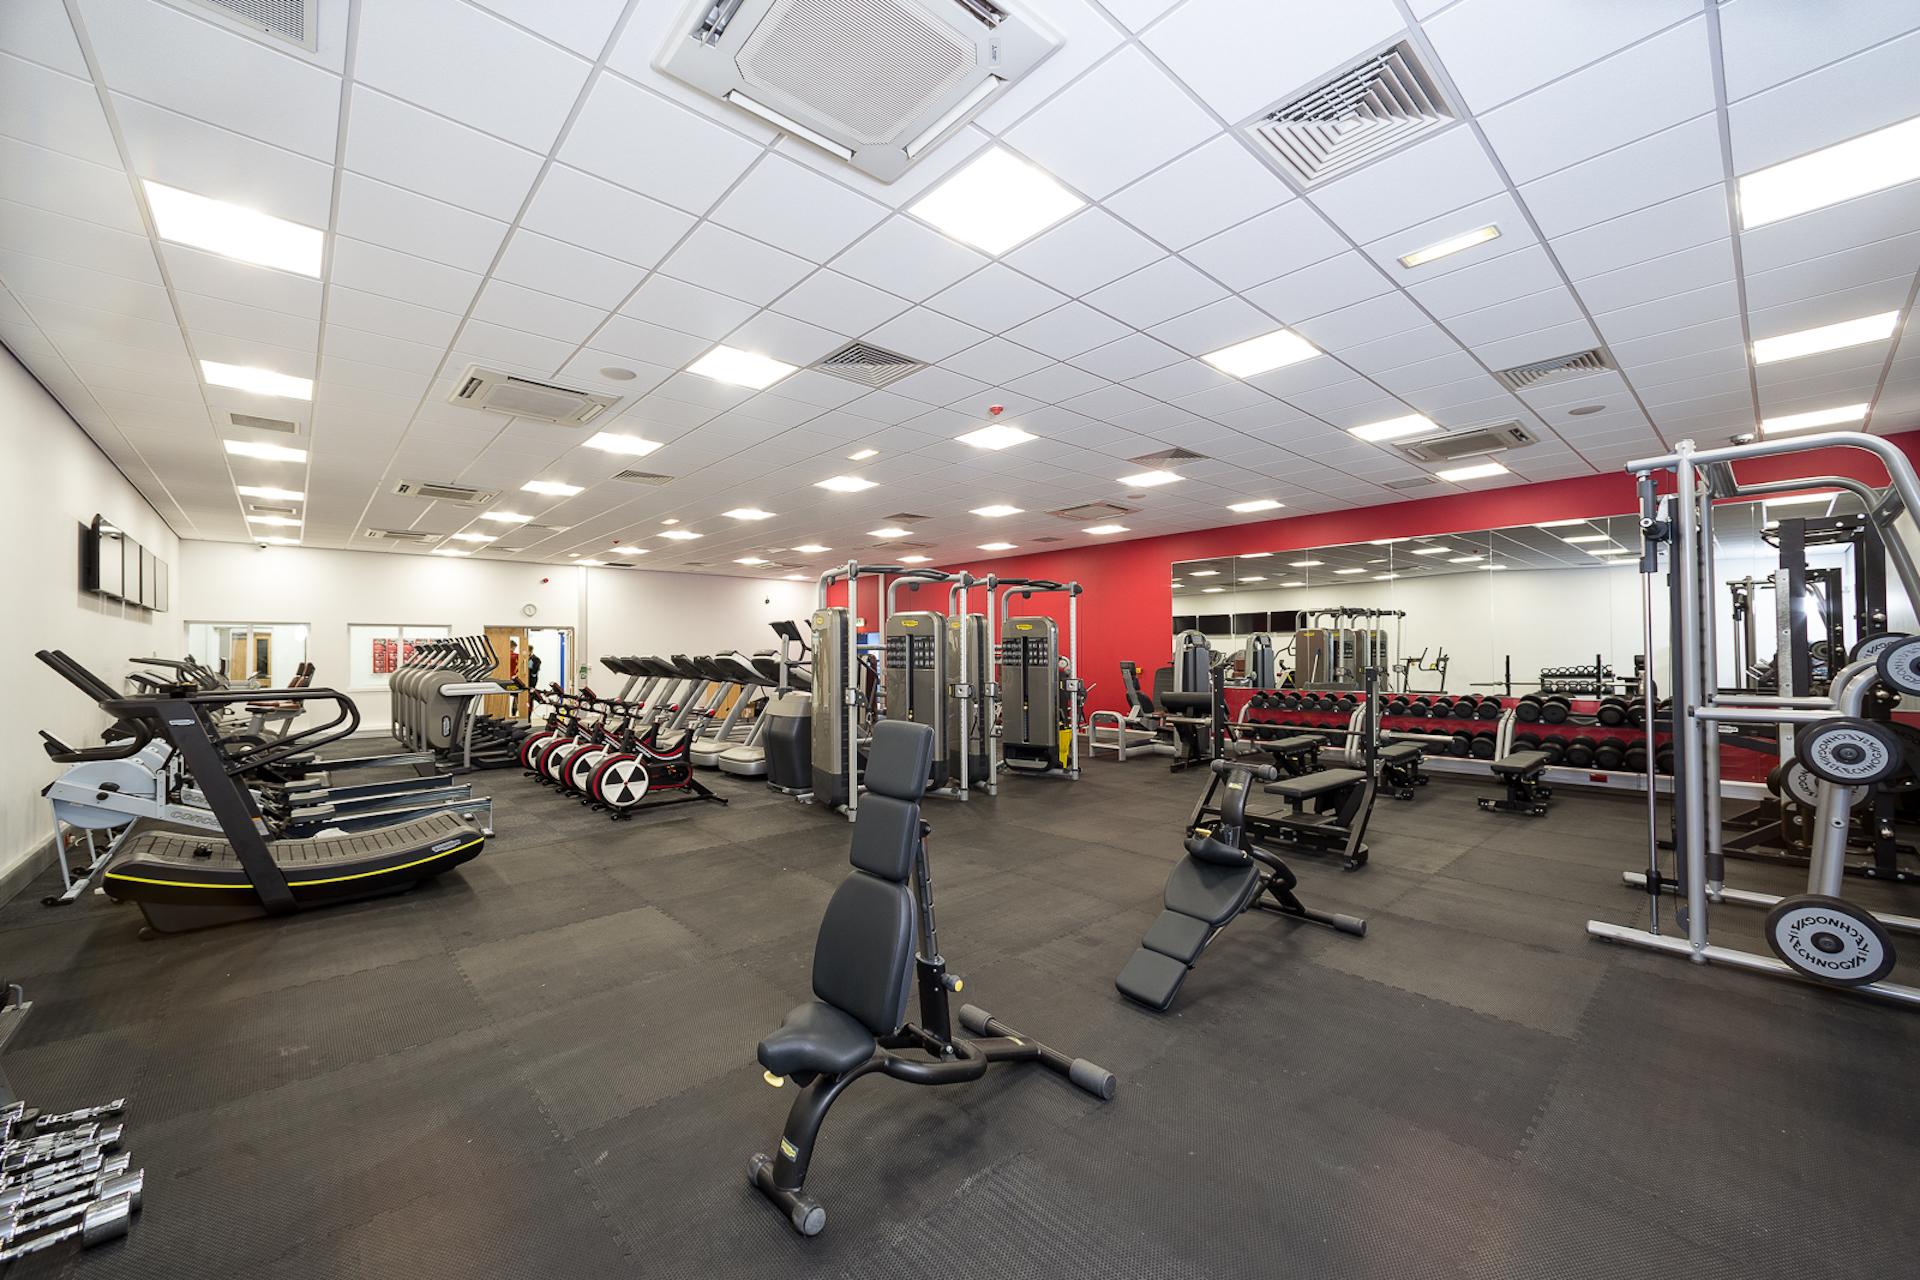 Colne Valley Leisure Centre 10